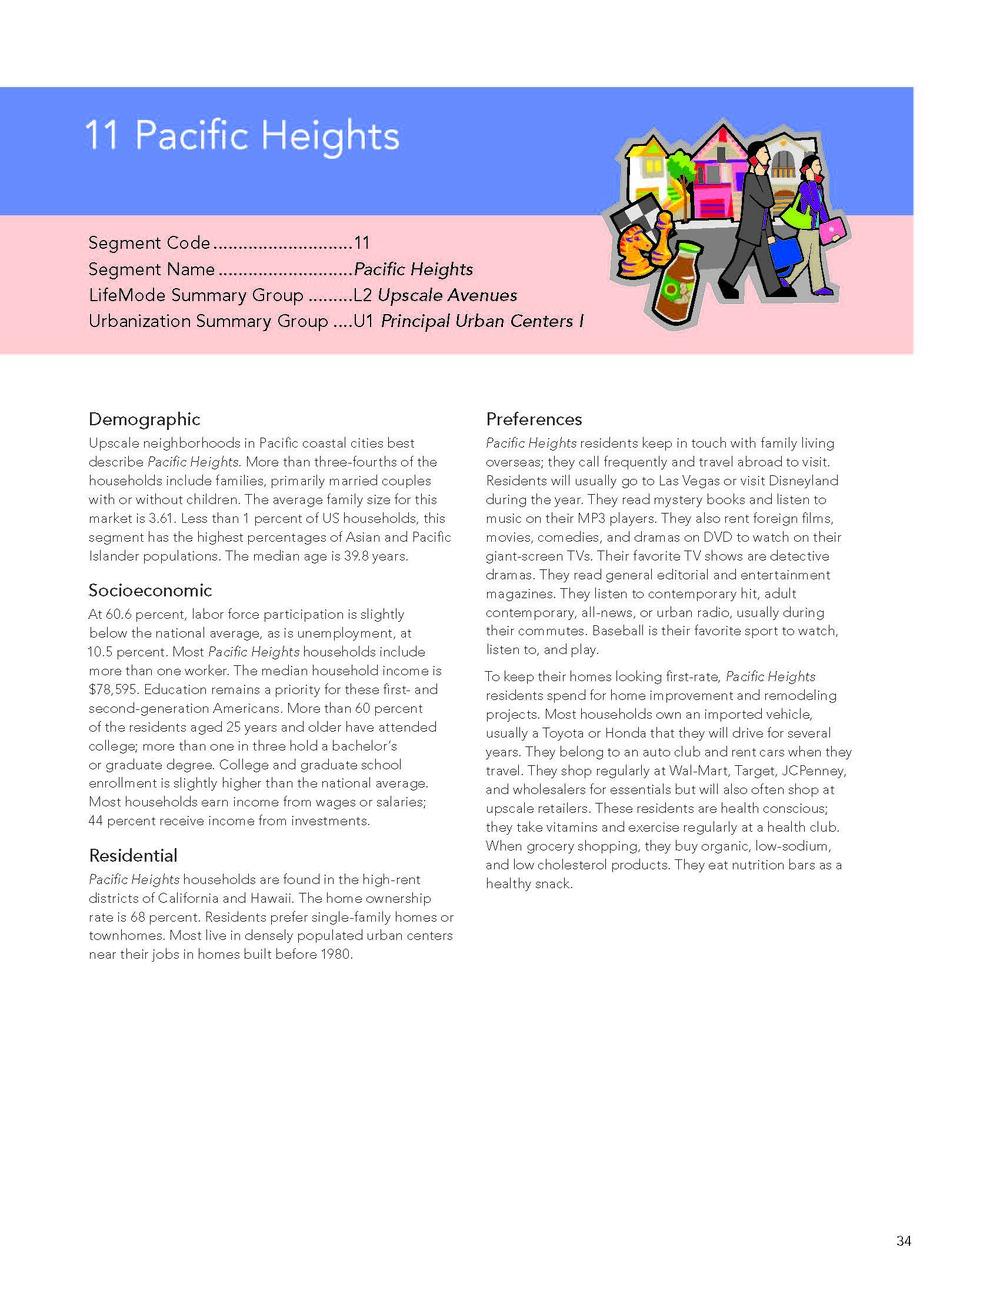 tapestry-segmentation_Page_37.jpg